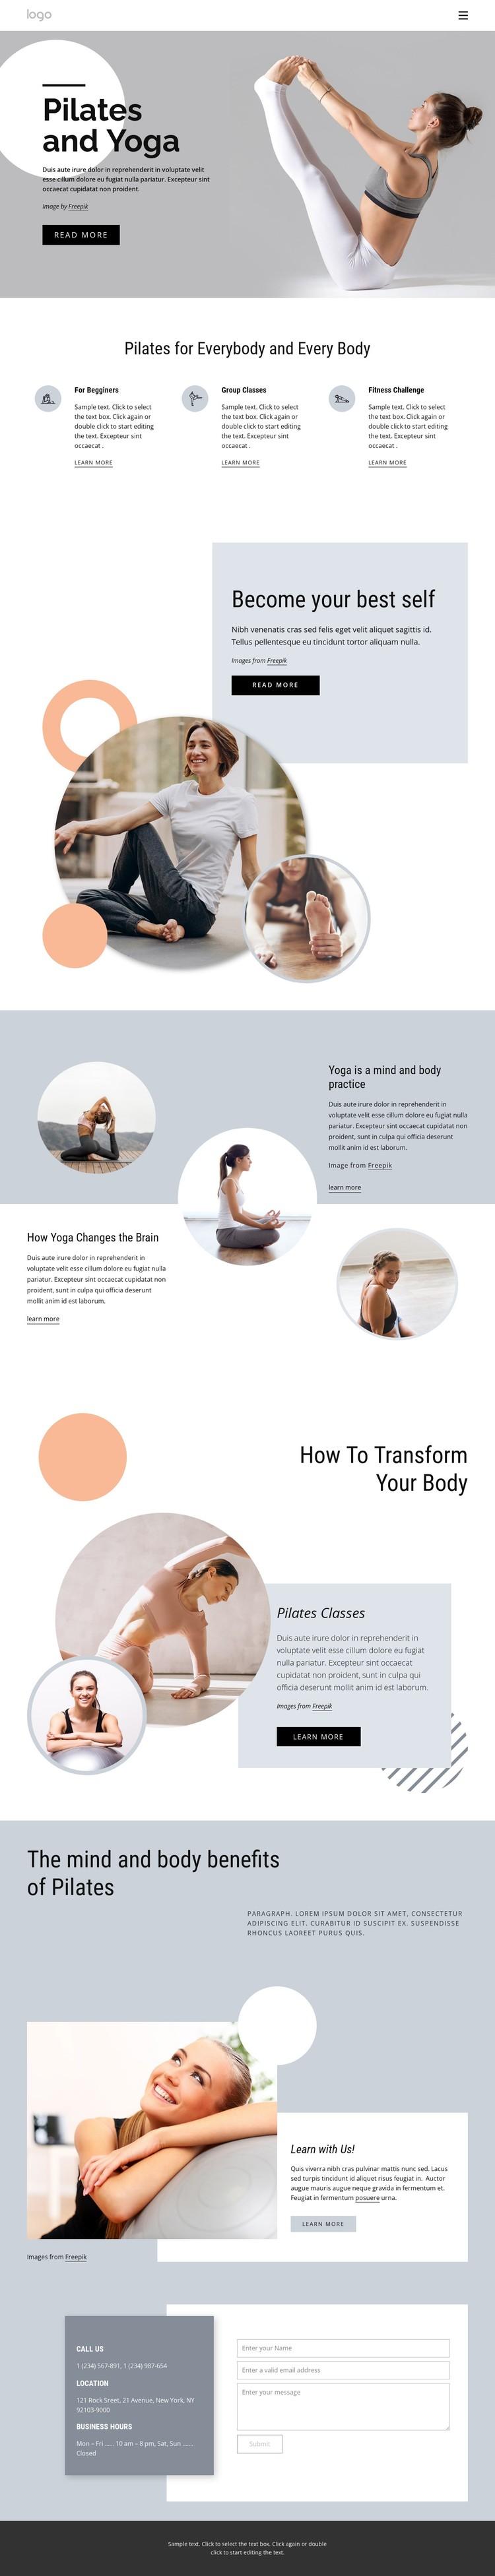 Pilates and yoga center Static Site Generator